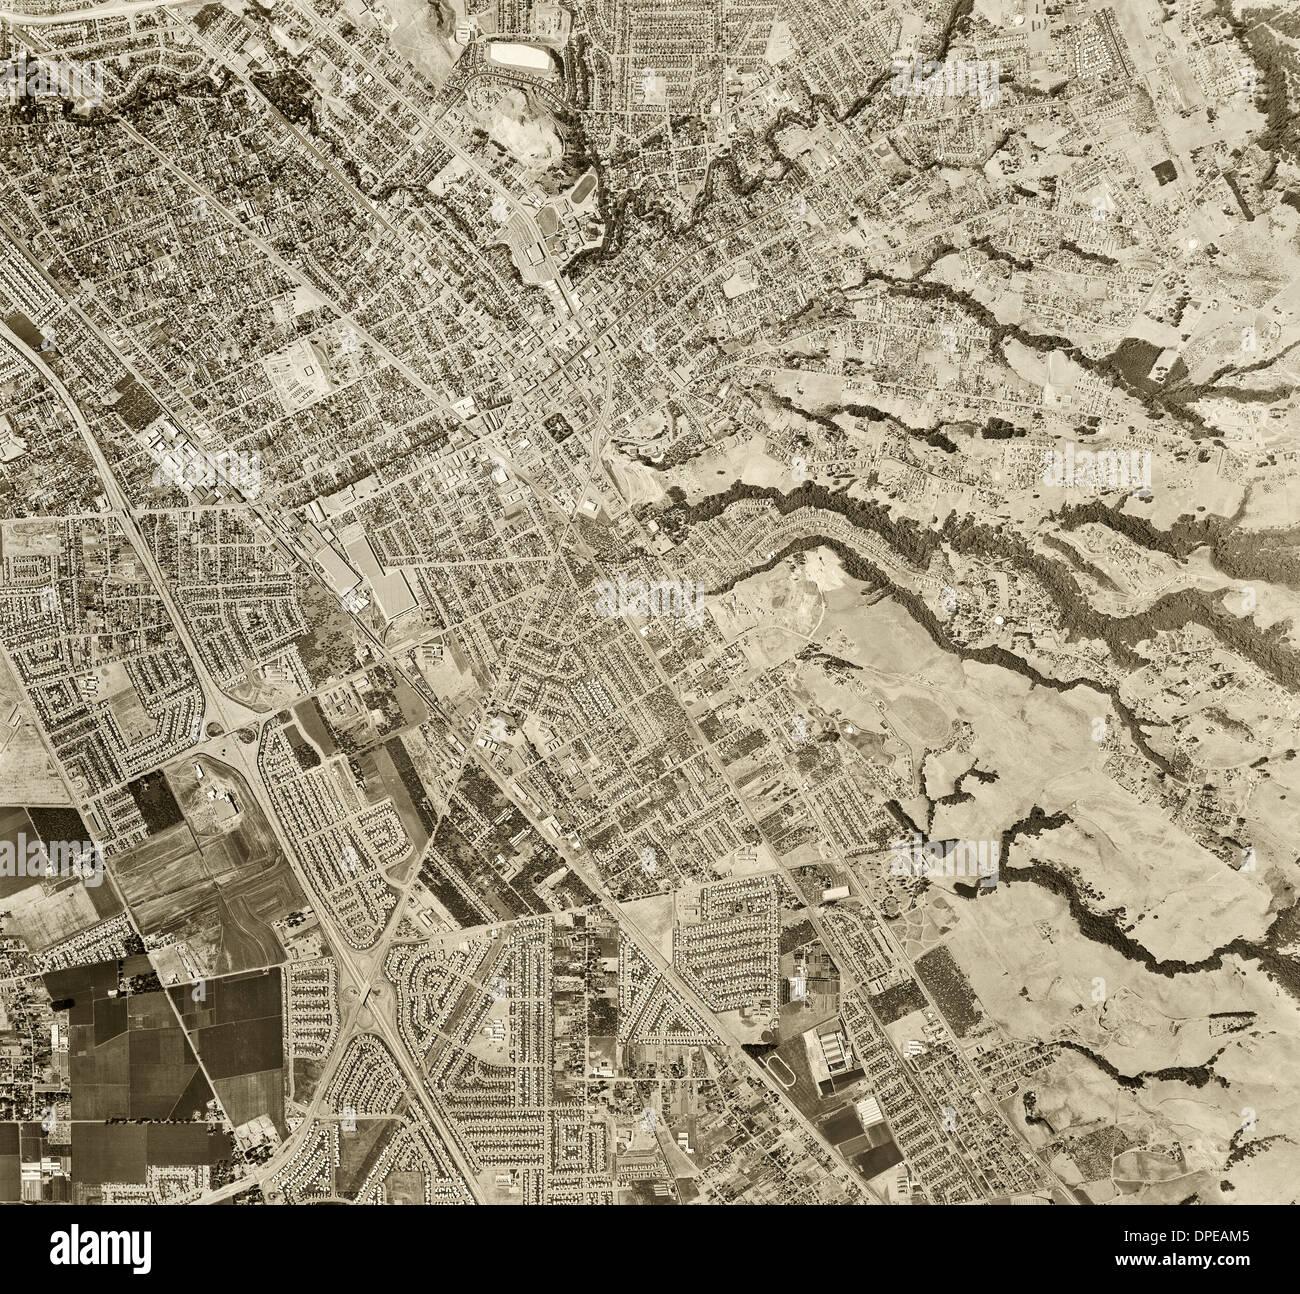 historical aerial photograph Hayward, Alameda county, California, 1958 - Stock Image